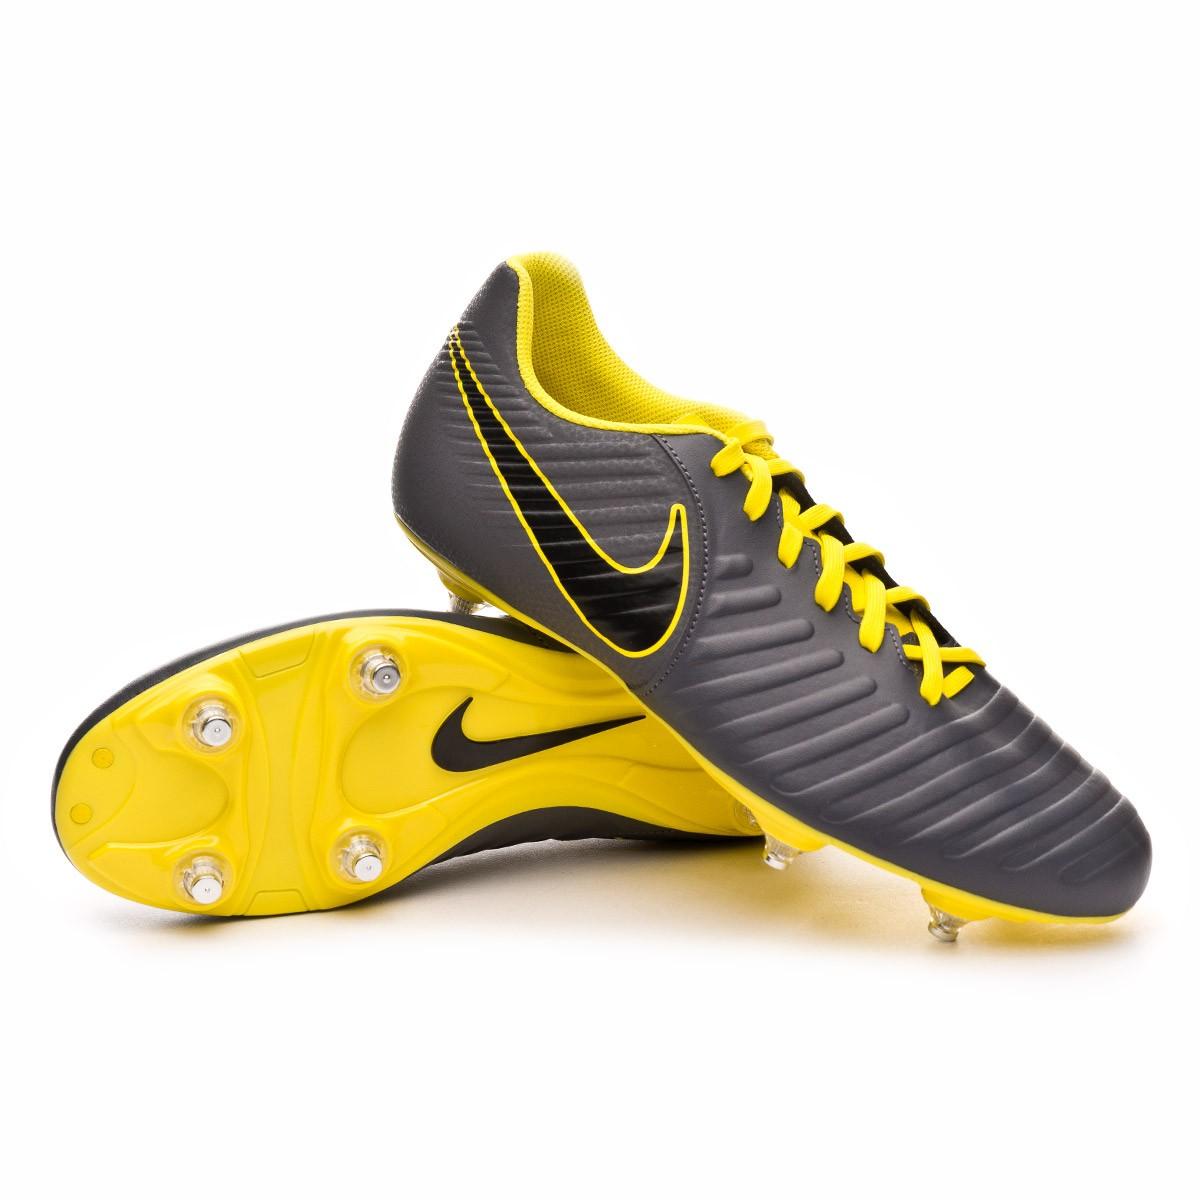 72ec67cff13 Football Boots Nike Tiempo Legend VII Club SG Dark grey-Black-Optical yellow  - Football store Fútbol Emotion